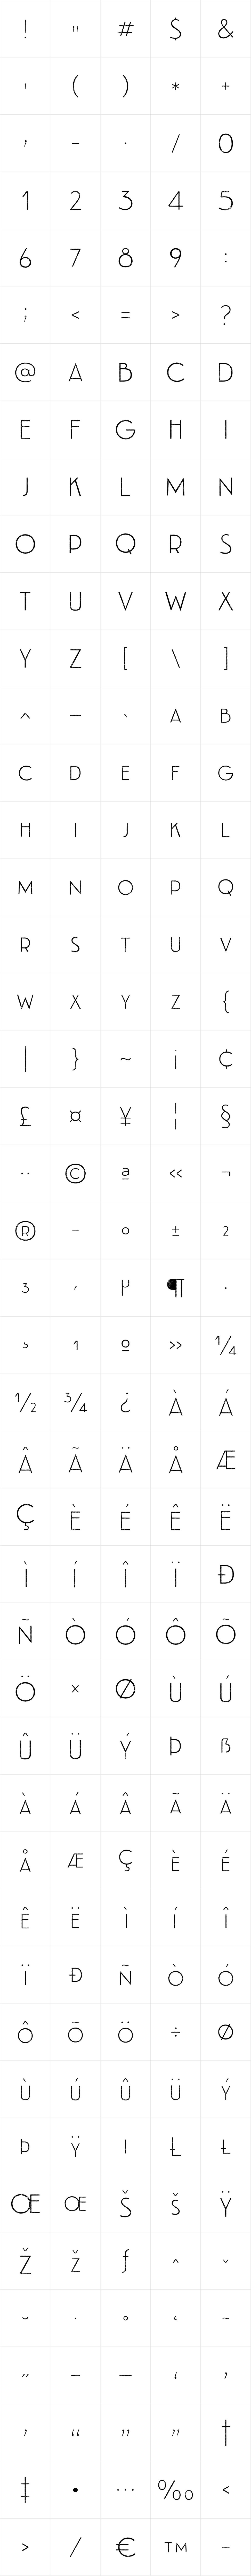 Emblema Fill 2 Basic